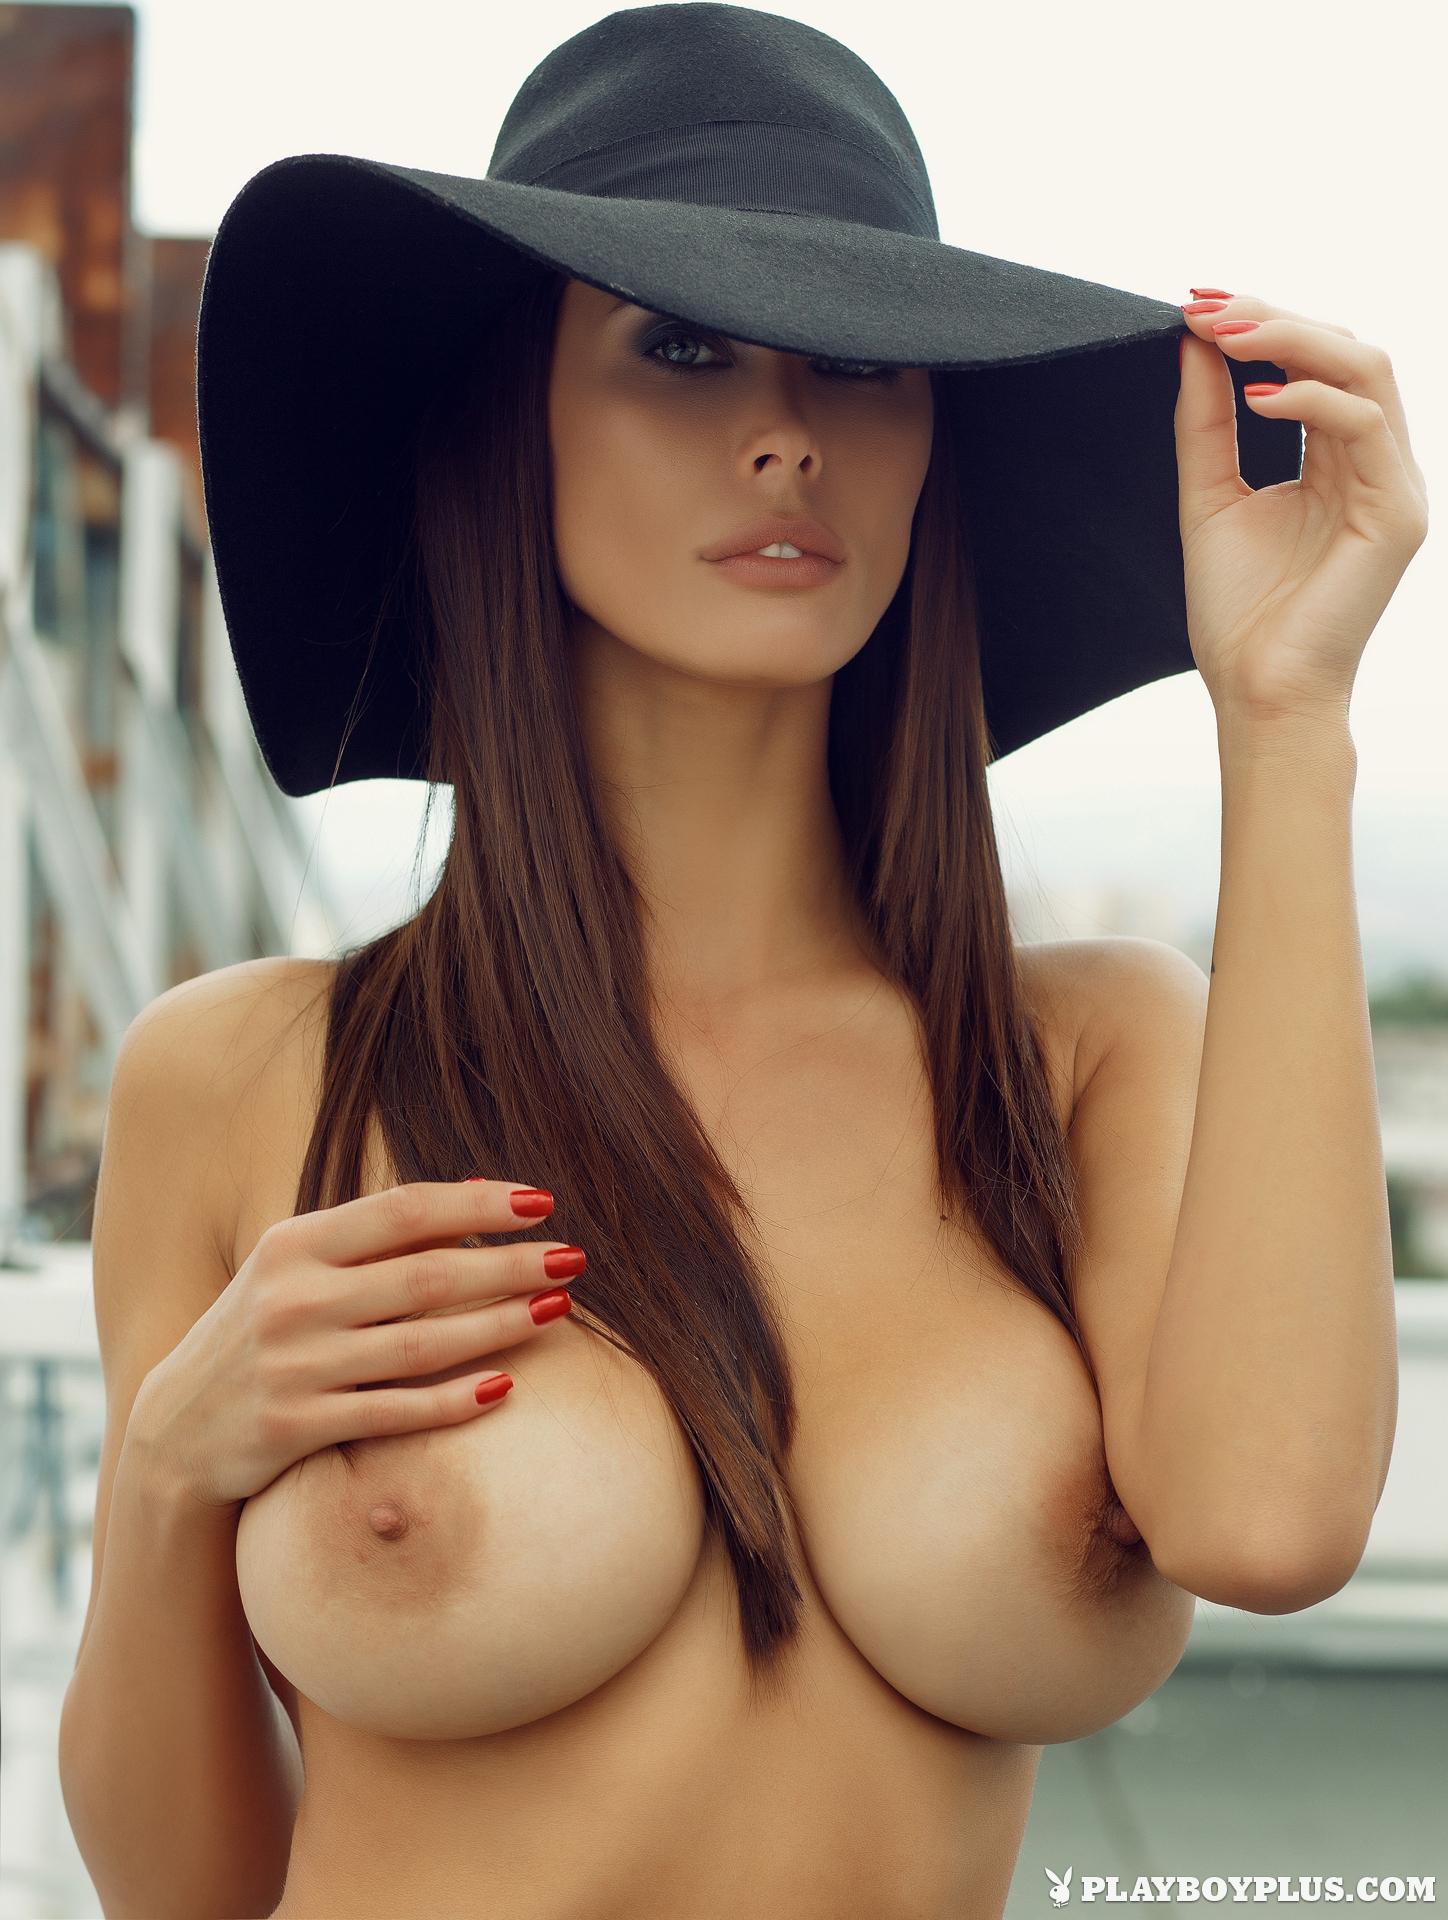 Six packs girl philipin nude